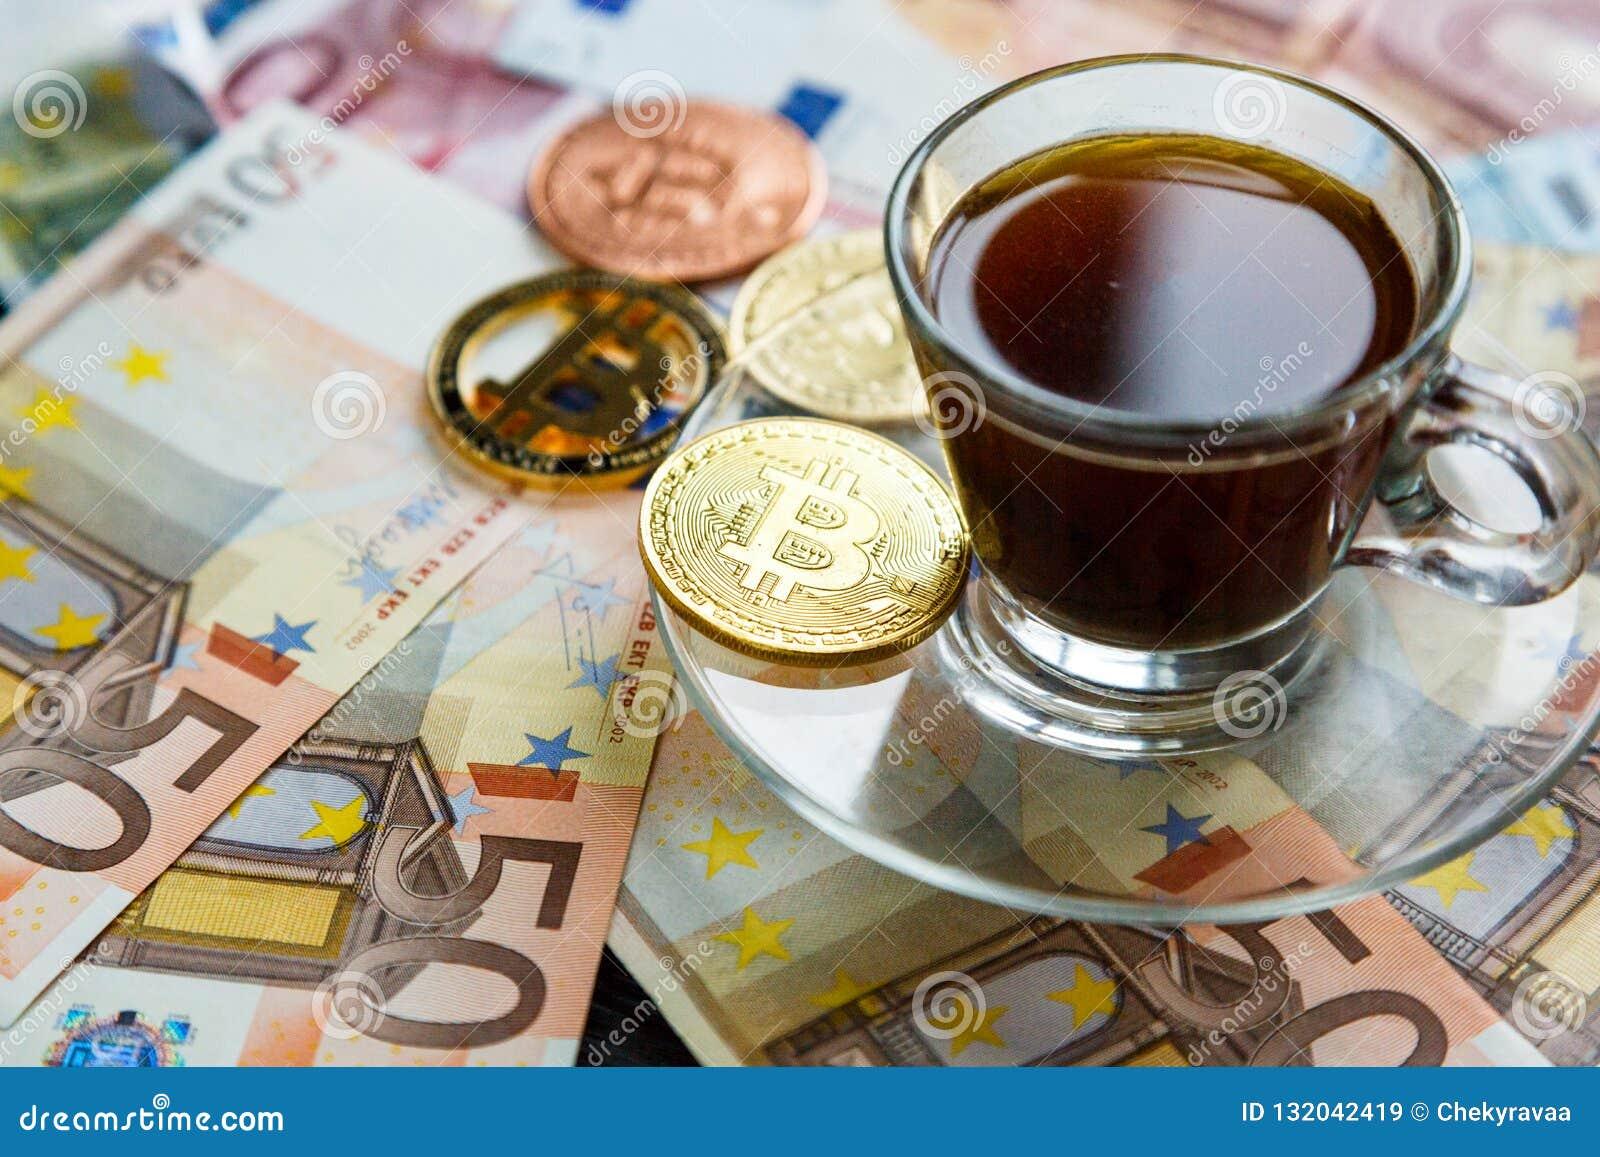 Bronze crypto currency investments joelmir betting doenca autoimmune protocol